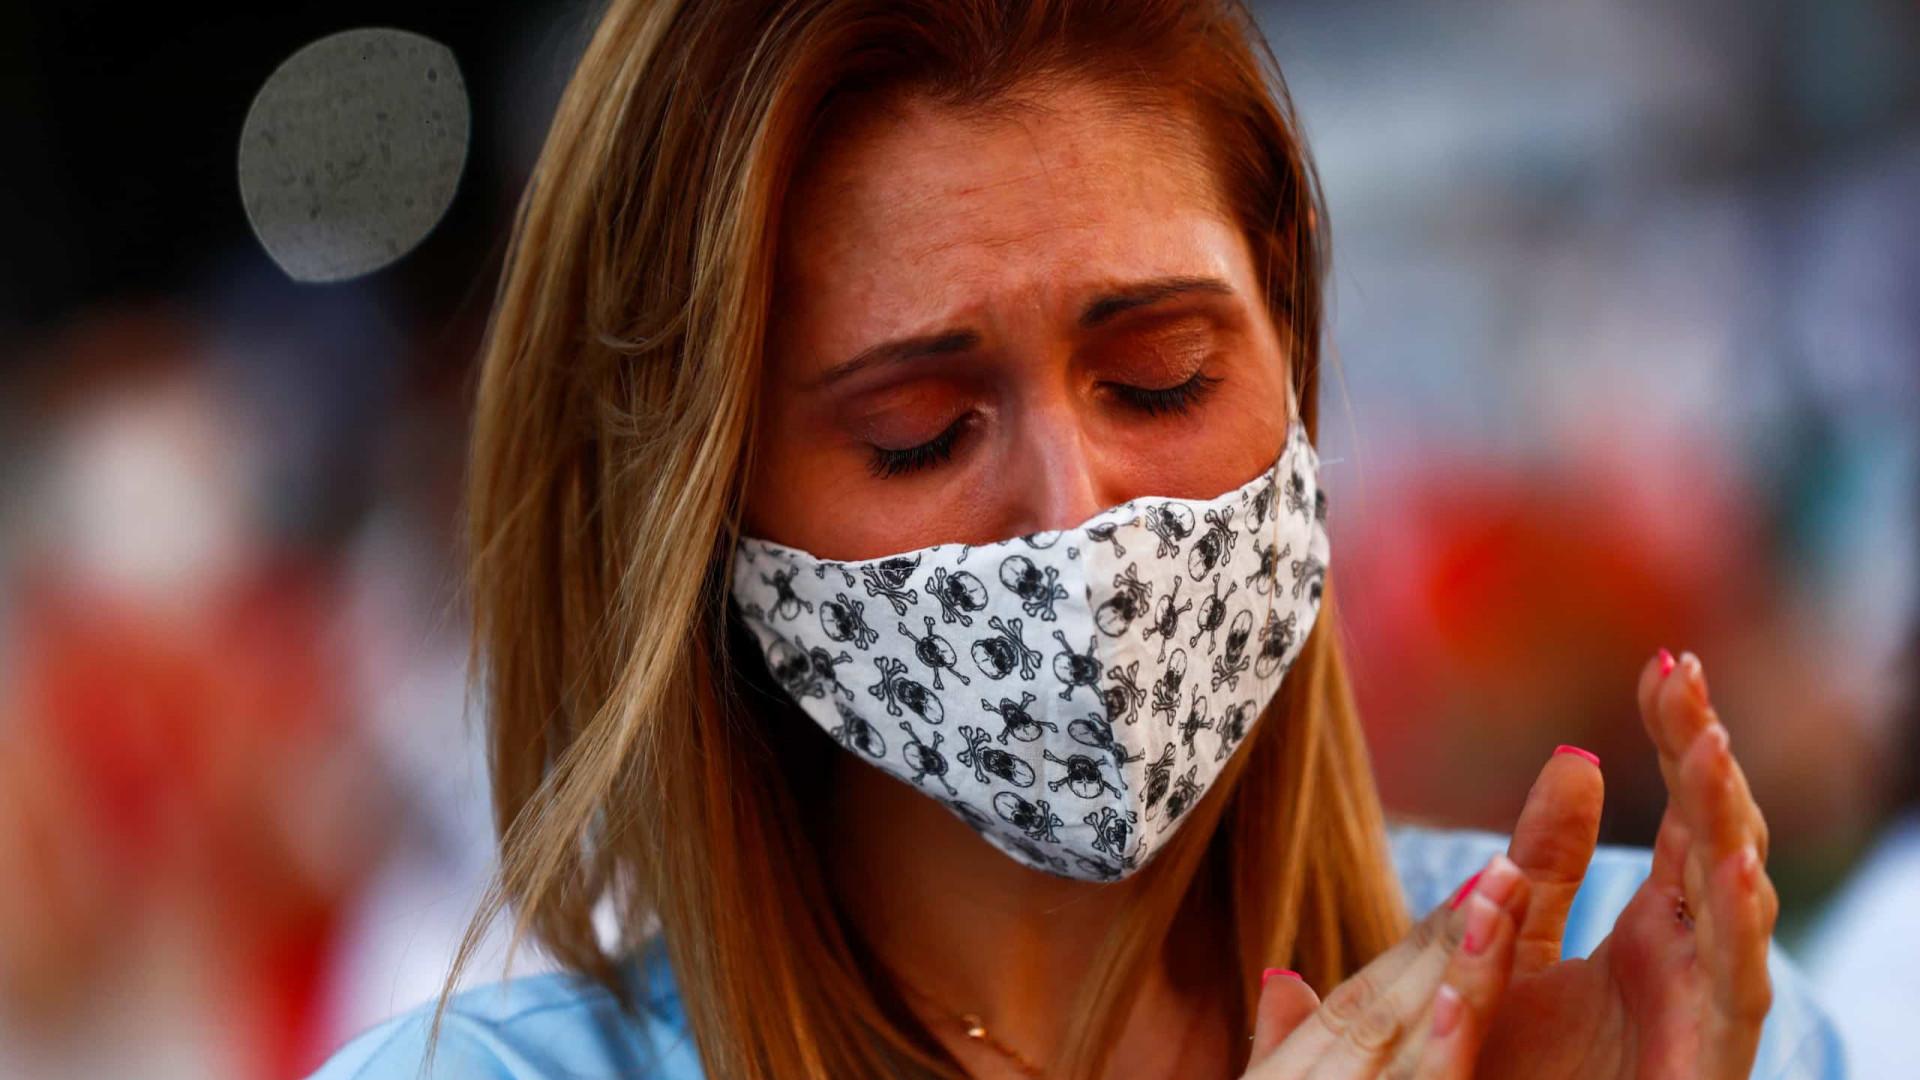 Brasil registra 1.595 novas mortes por covid-19, total chega a 90.134